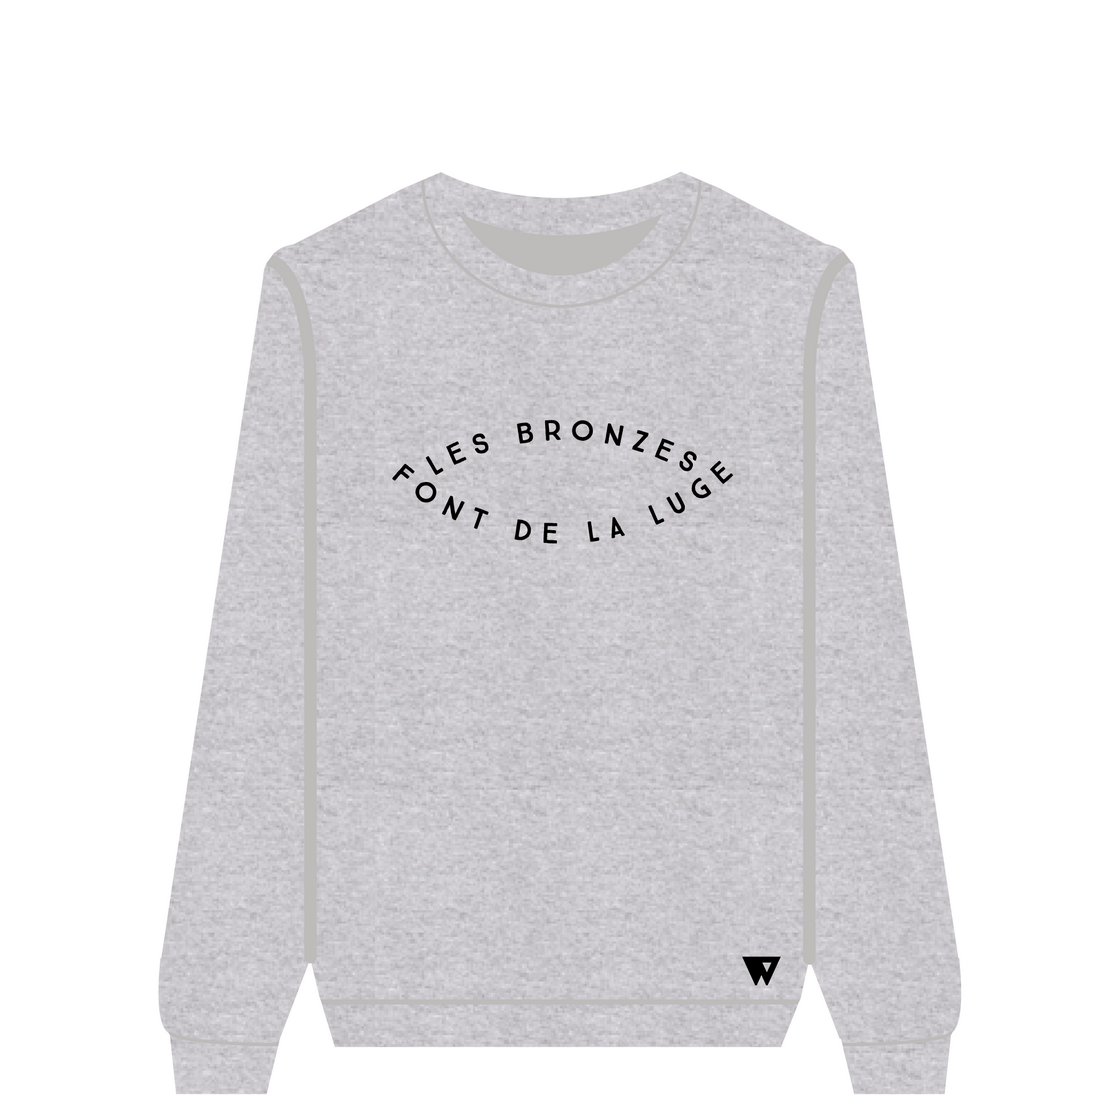 Sweatshirt Les Bronzes Font De La Luge | Wuzzee